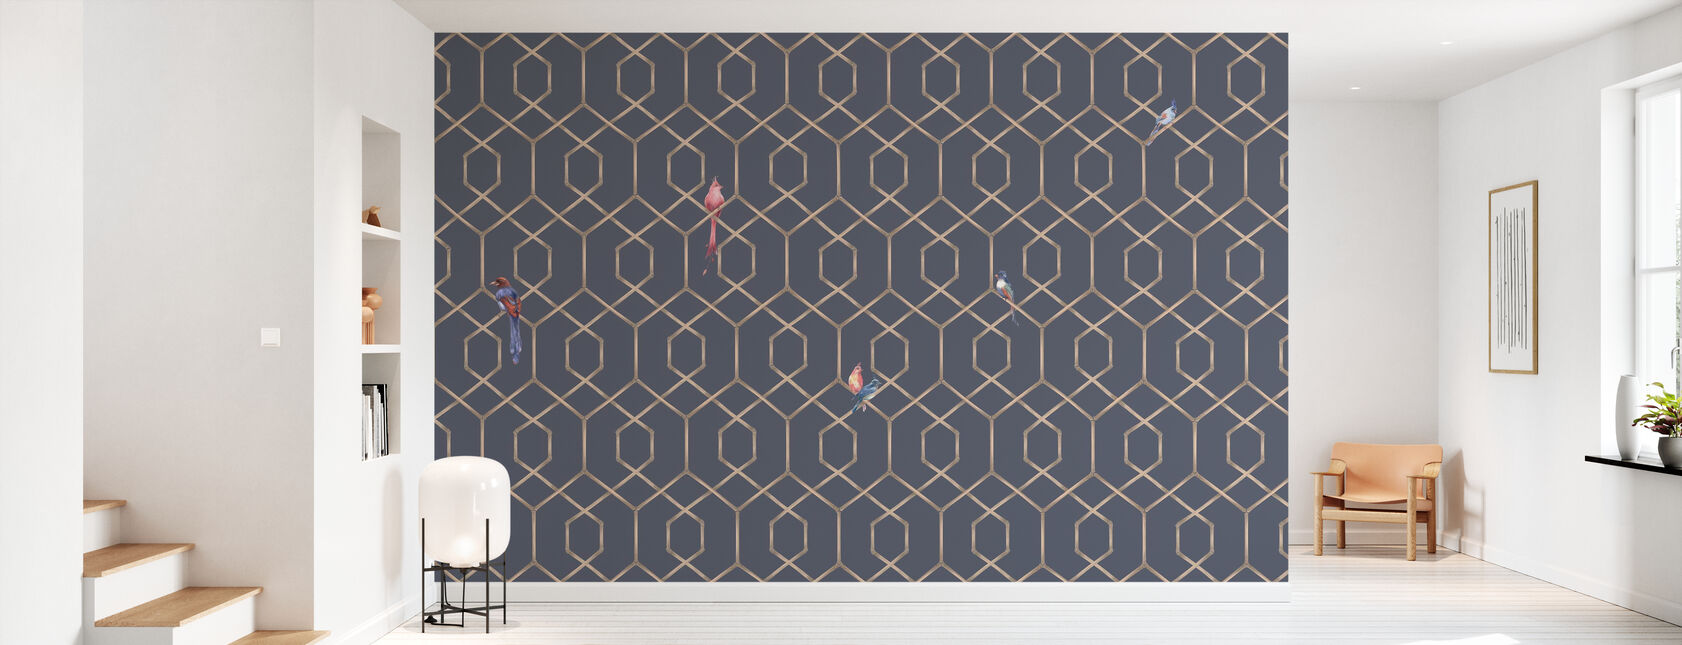 Scalet´s Bamboo Web - Ash Blue - Wallpaper - Hallway